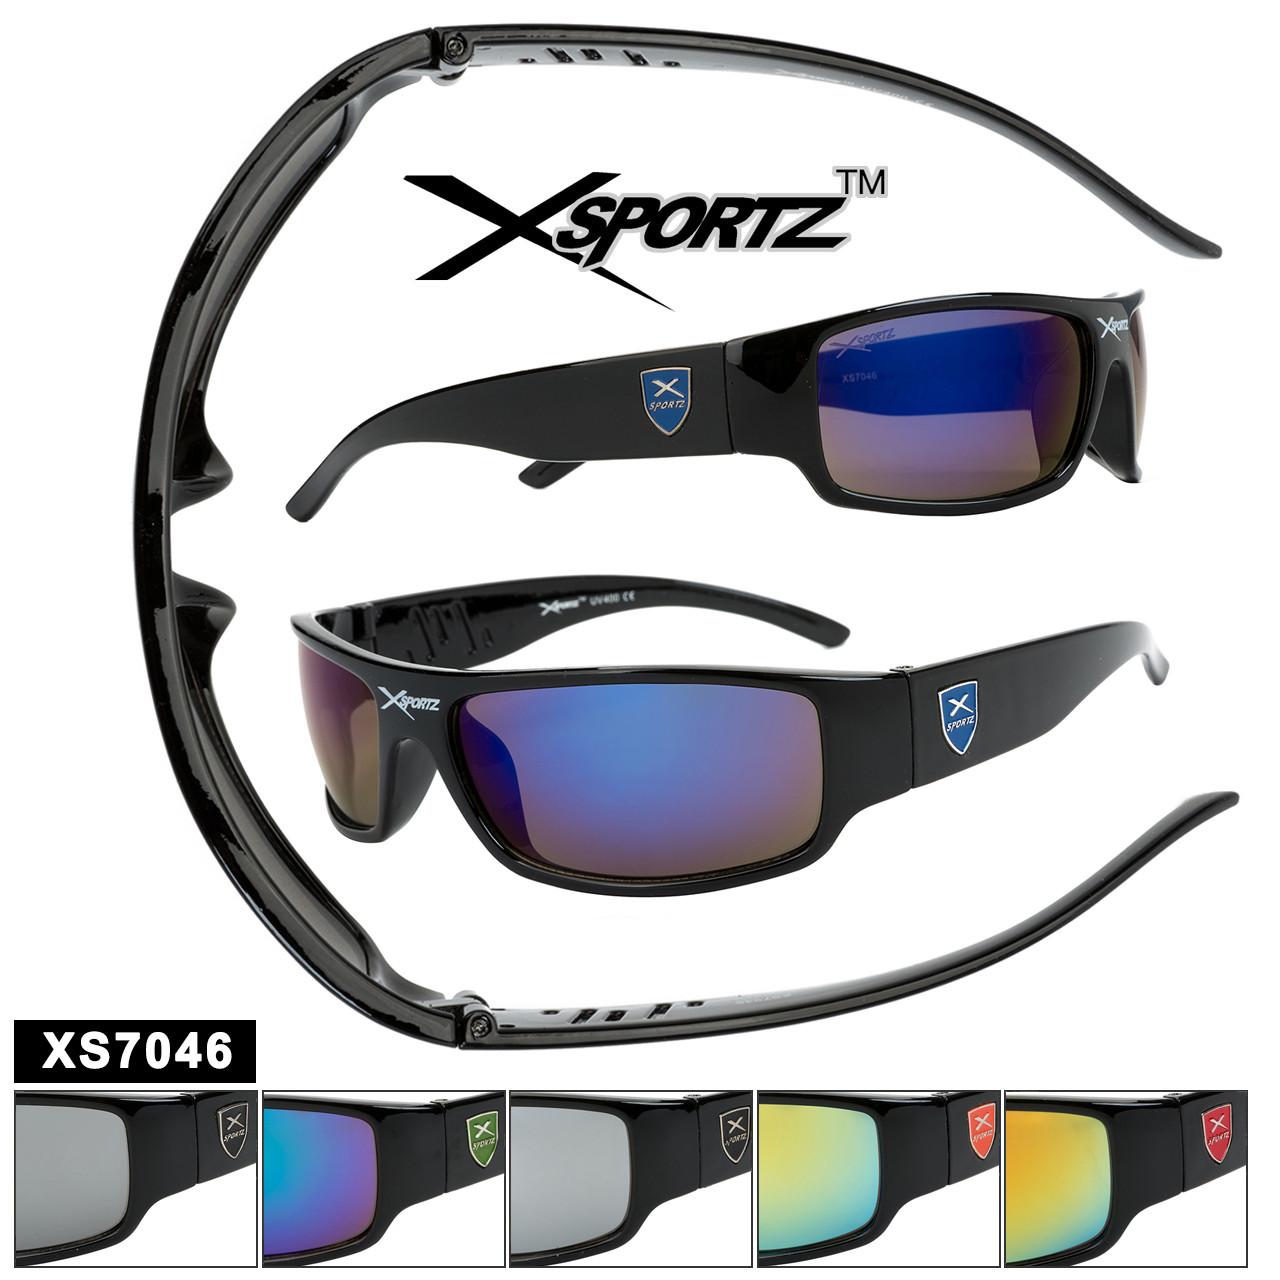 Sports Sunglasses by the Dozen - Style XS7046